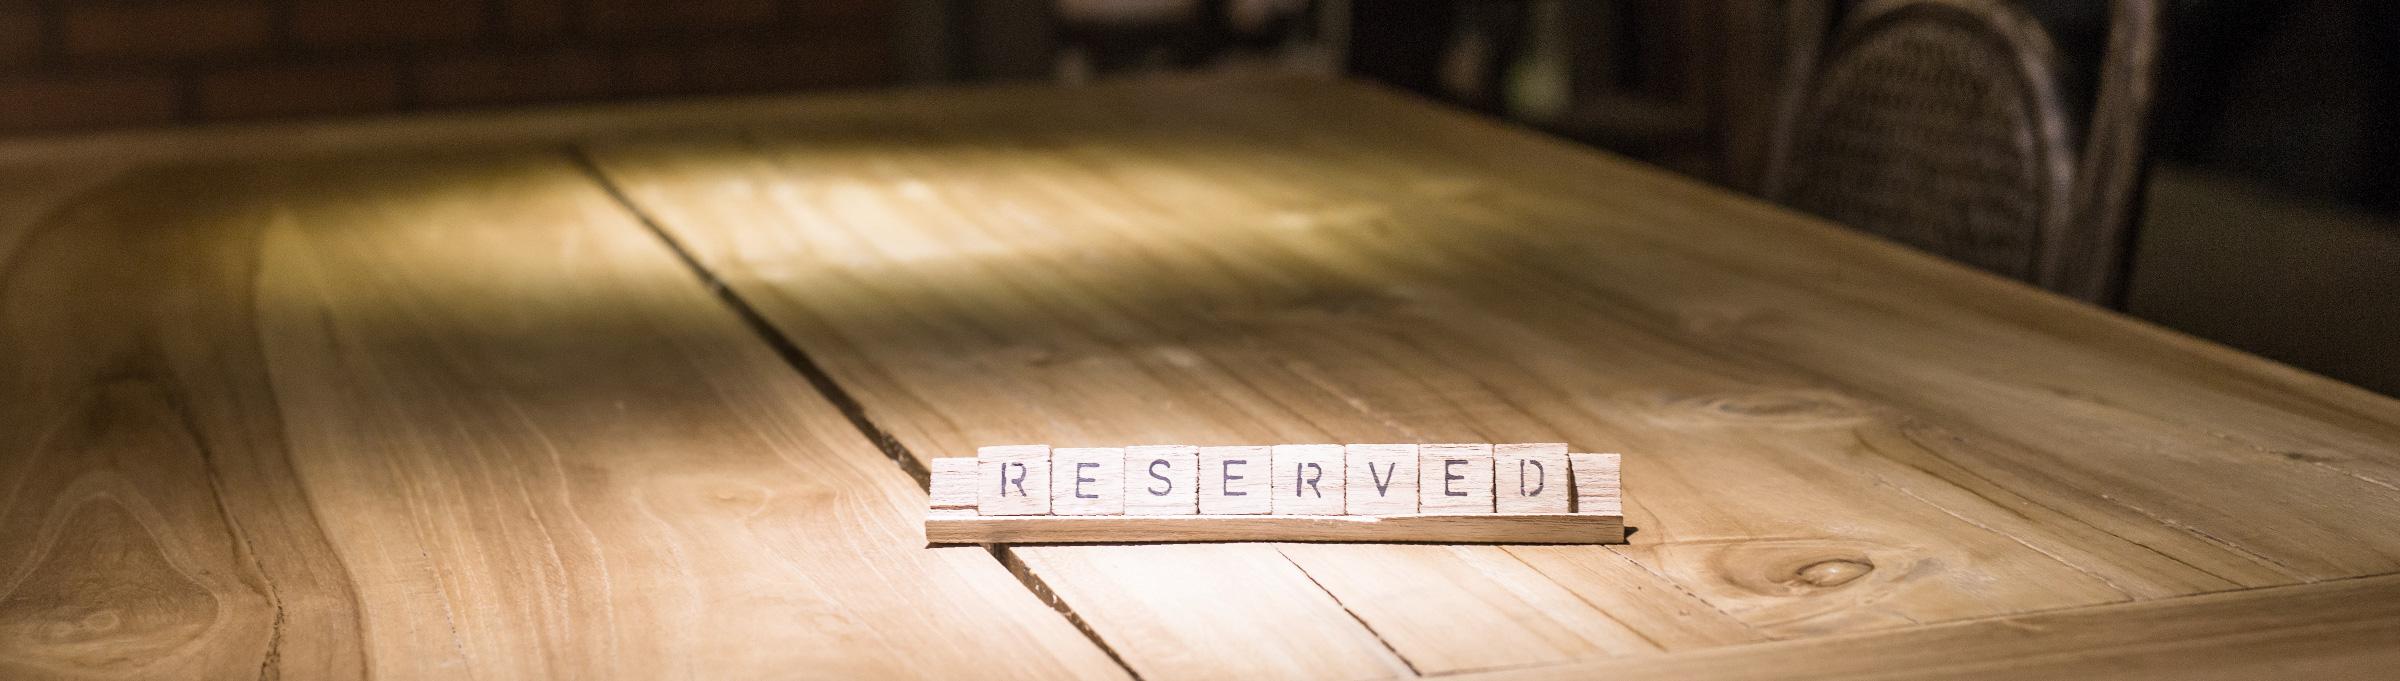 04_reserve-01